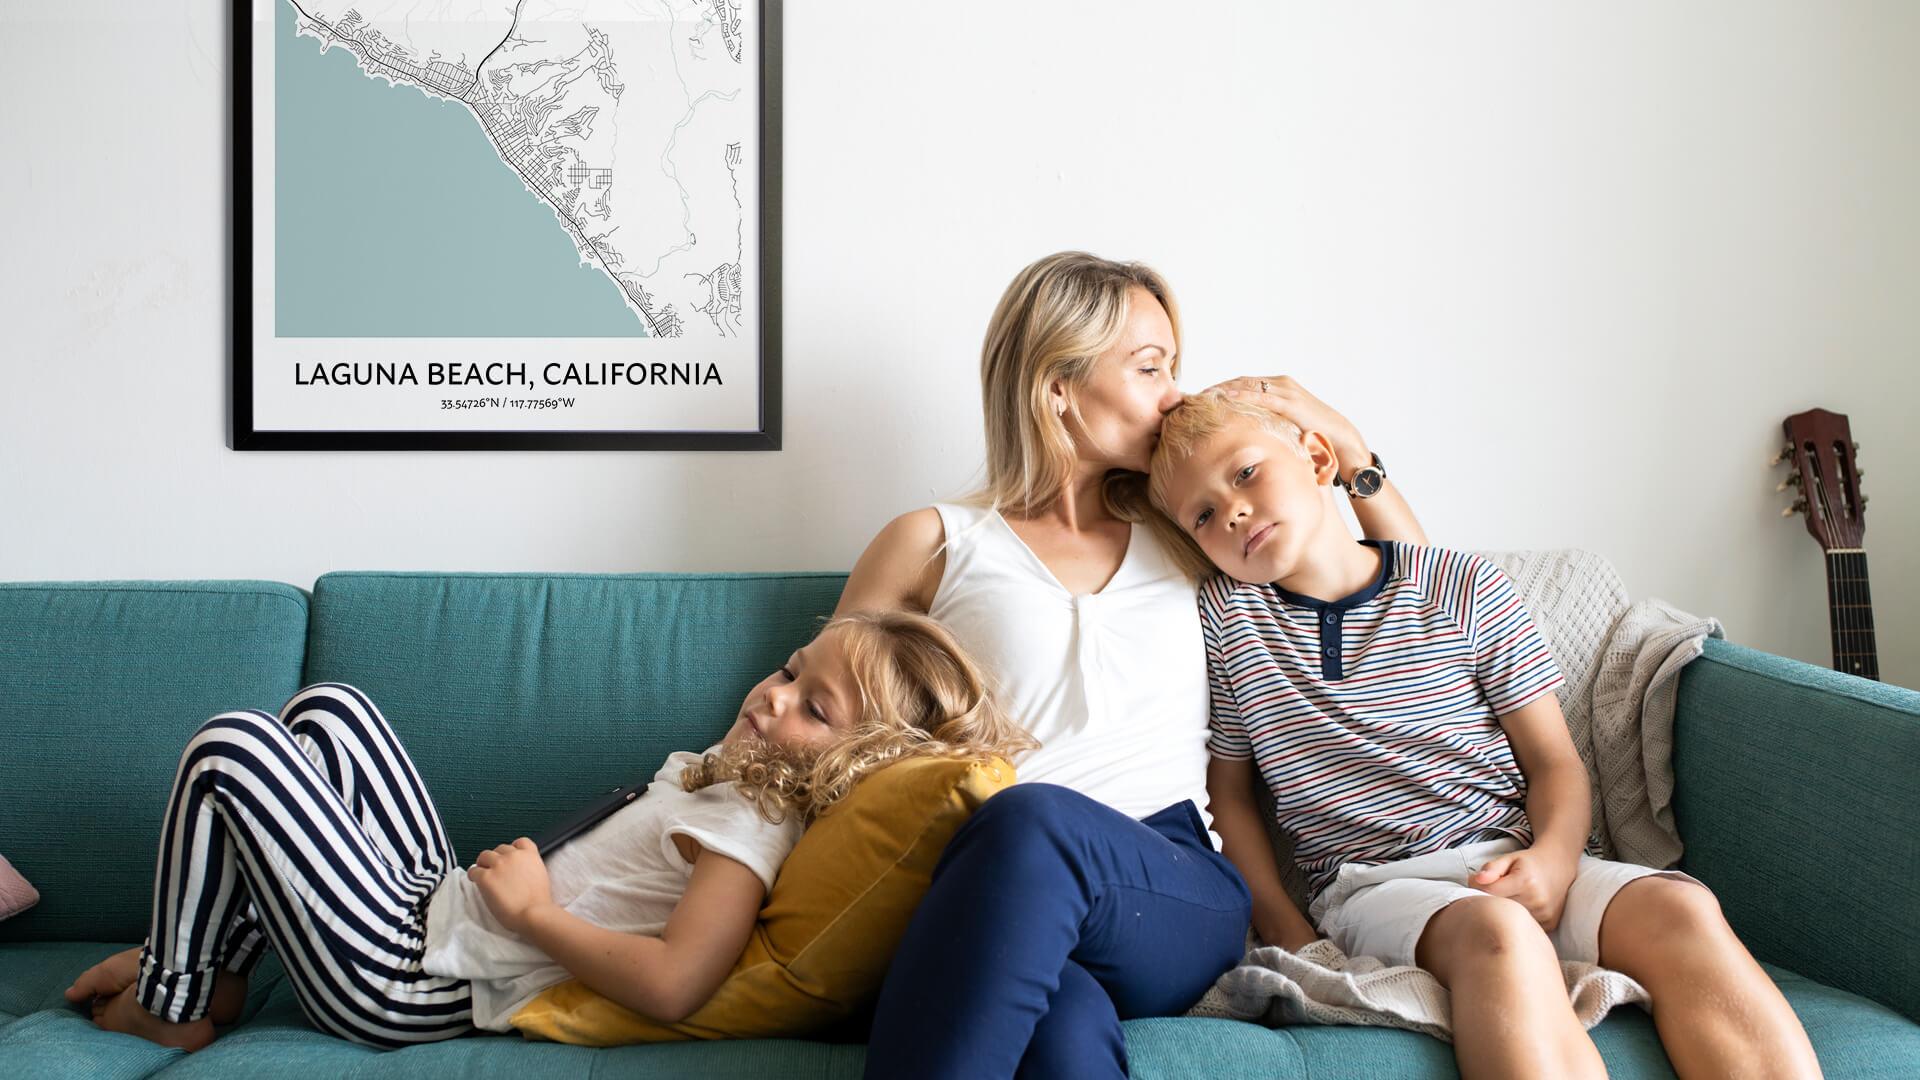 Laguna Beach map poster